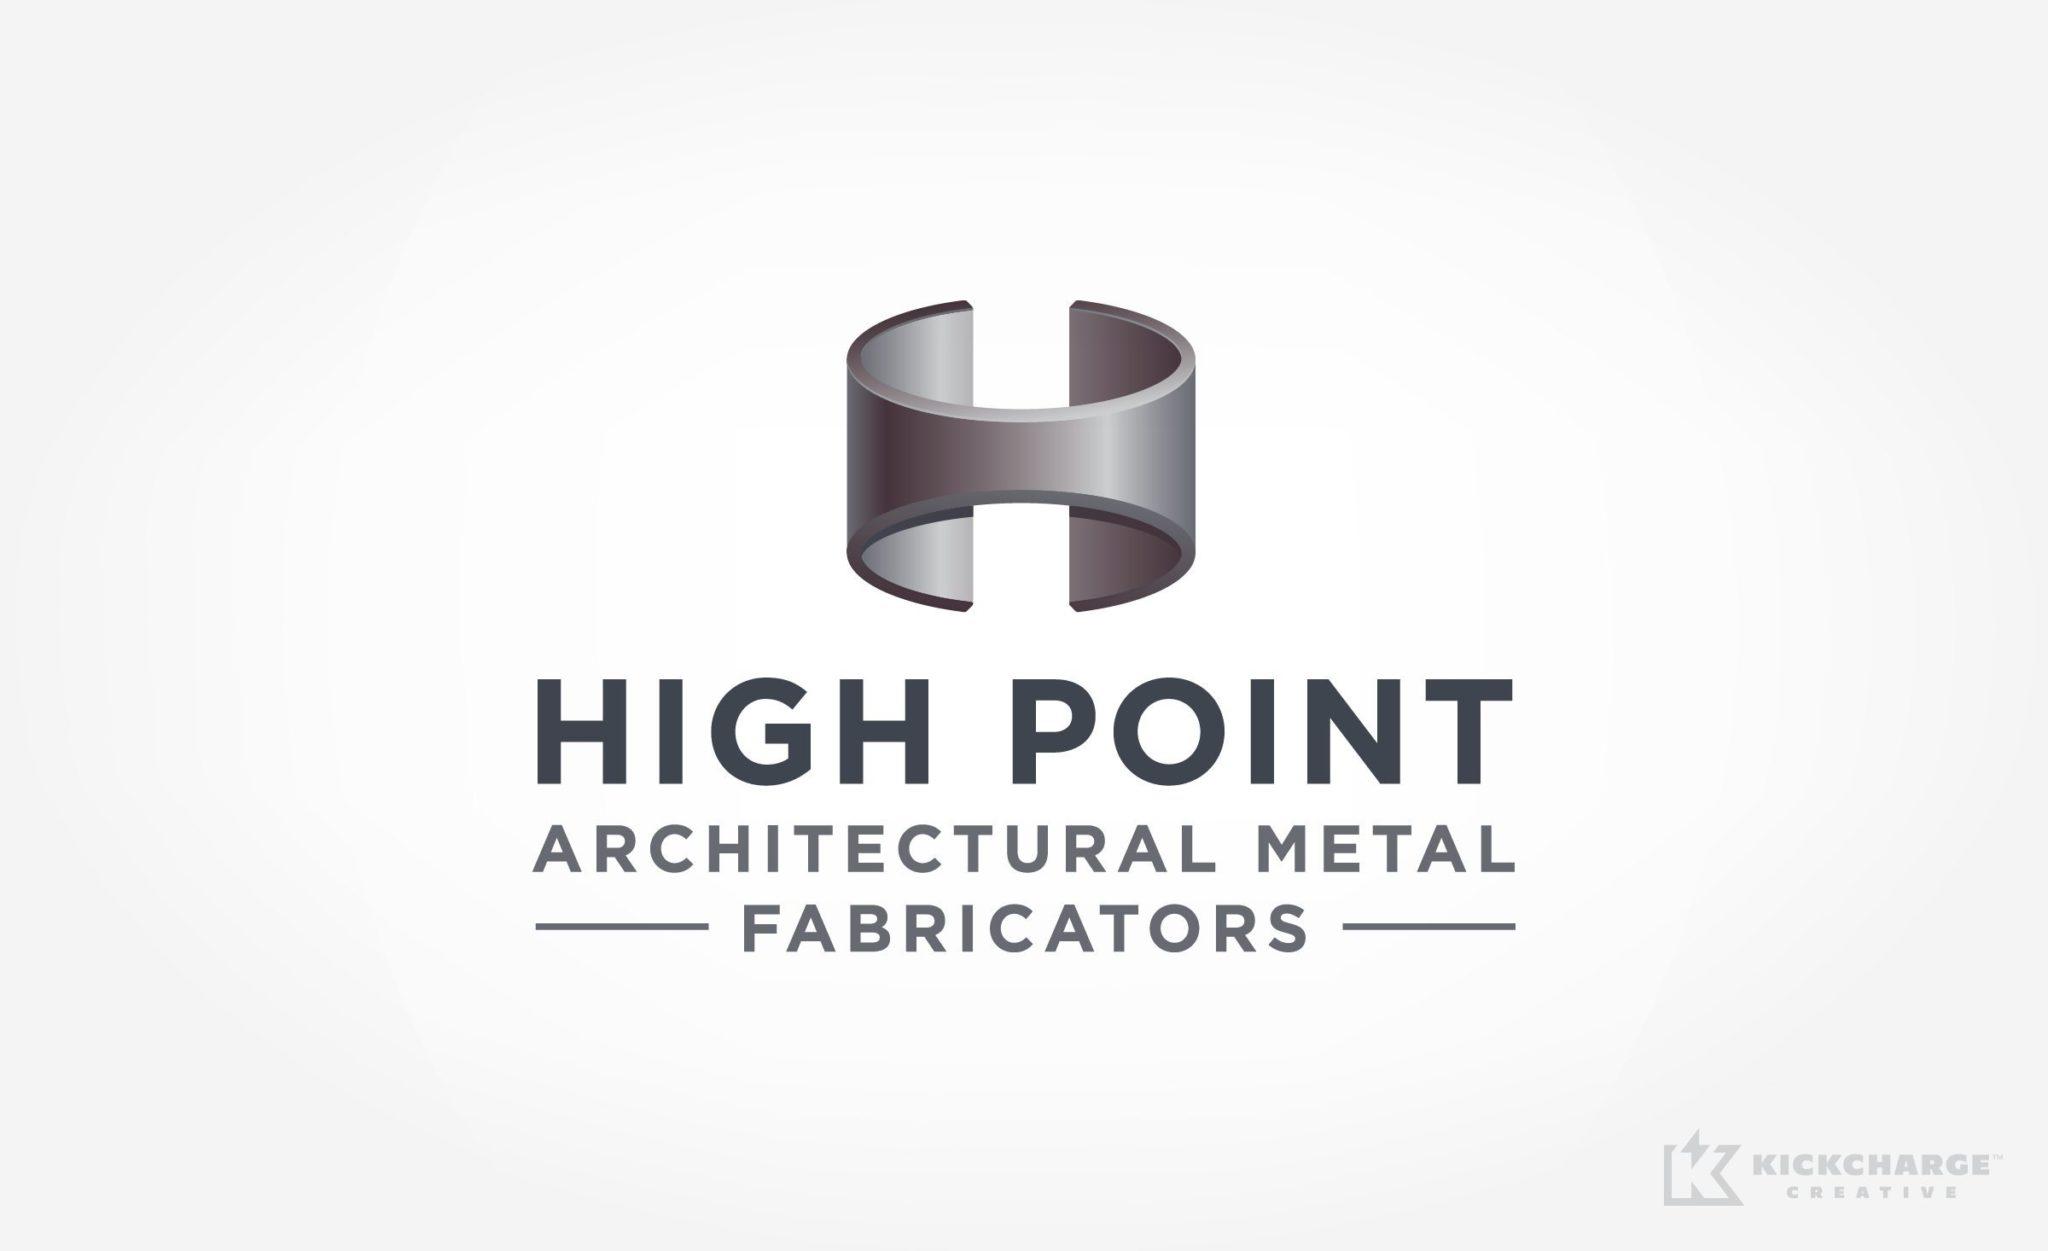 Branding for welding company located in Hackettstown, NJ.